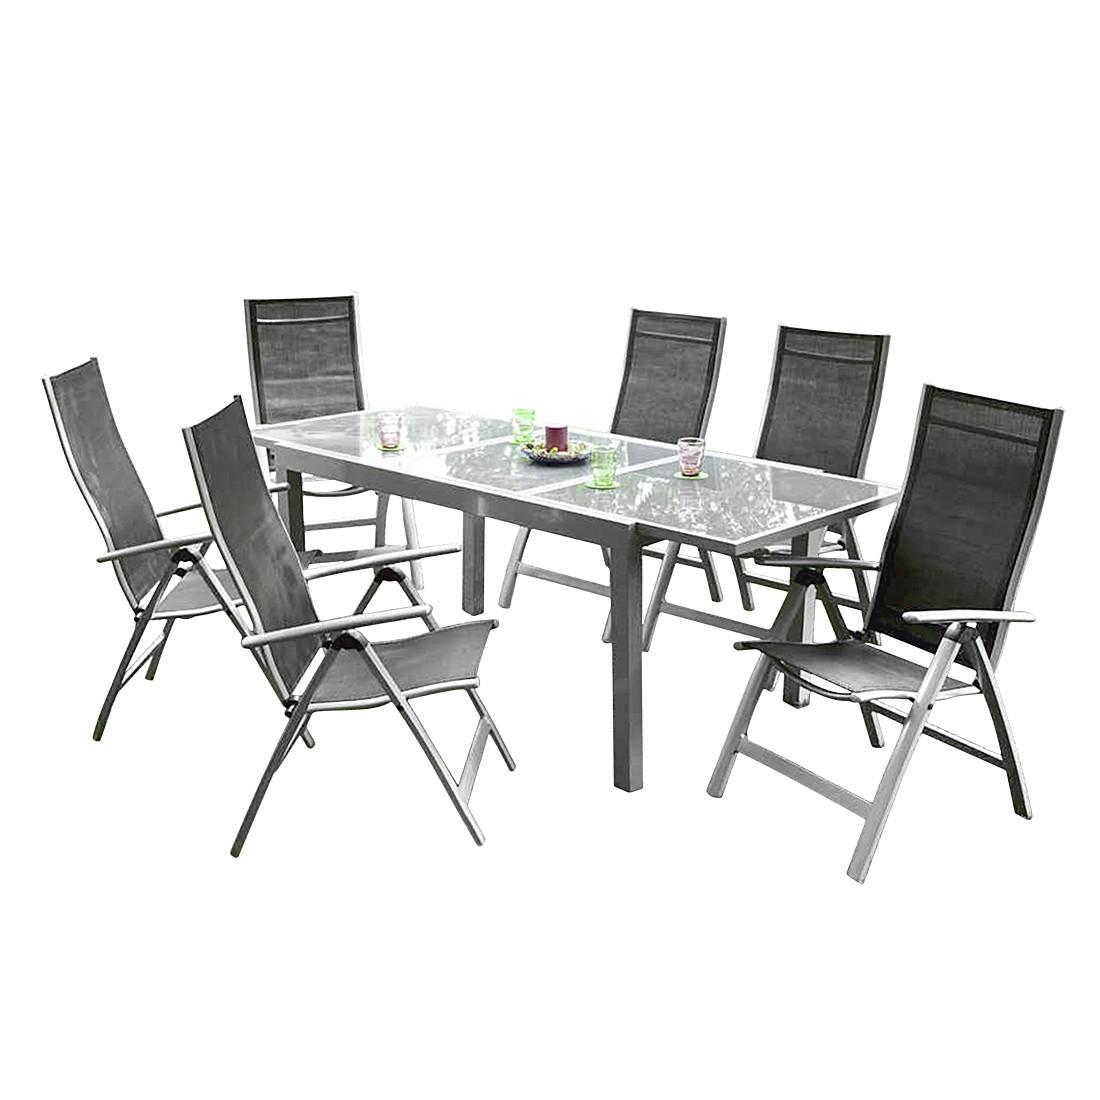 Gartensitzgruppe Carrara I (7-teilig) – Aluminium Silber/Kunstfasergewebe Schwarz, Merxx online kaufen